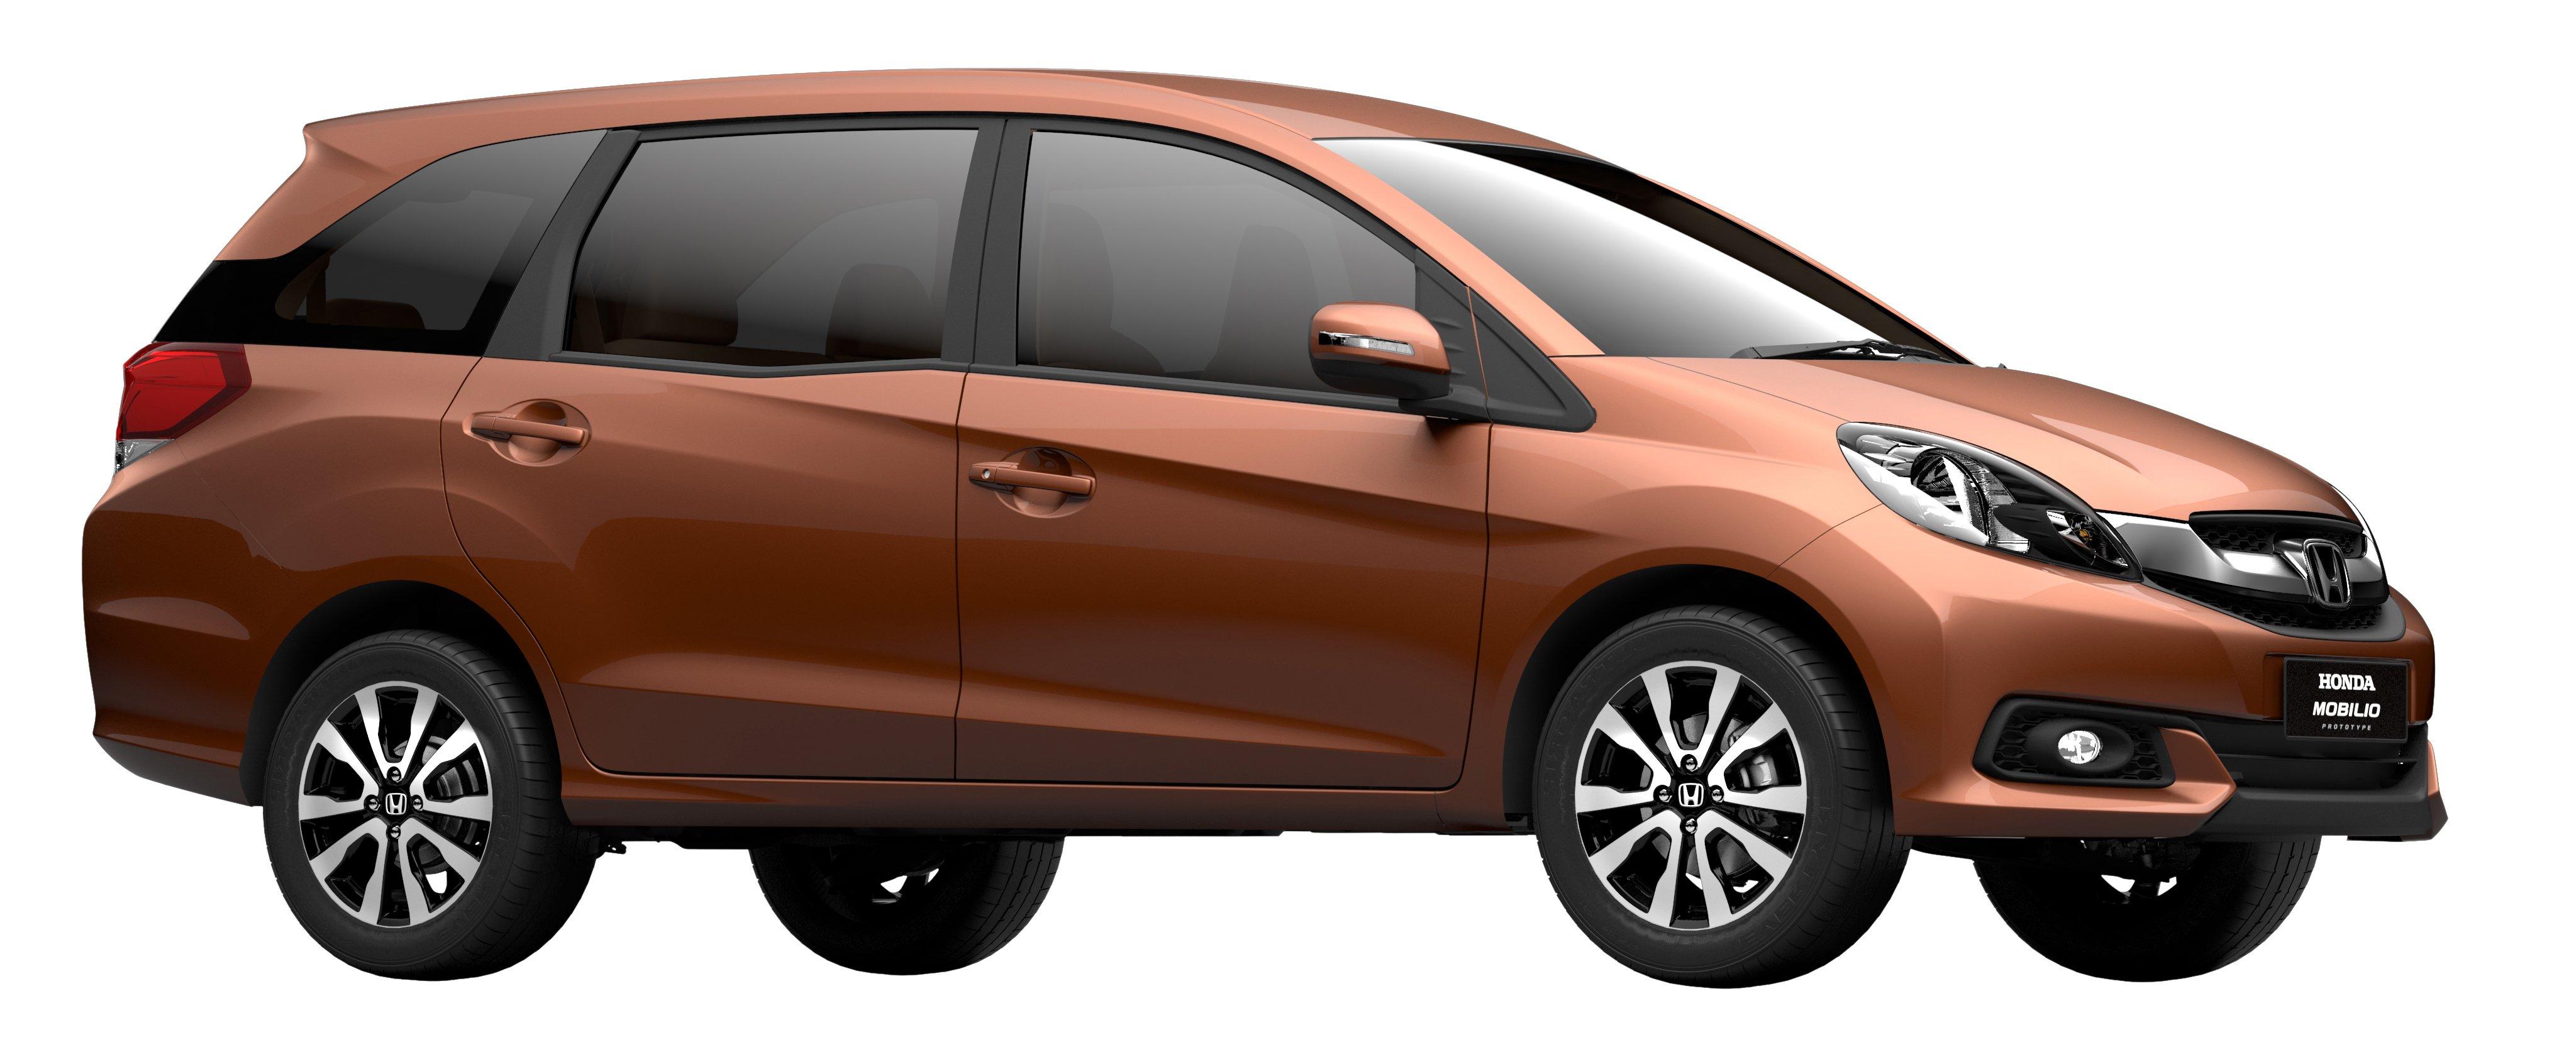 Honda Mobilio MPV Unveiled At IIMS 2013